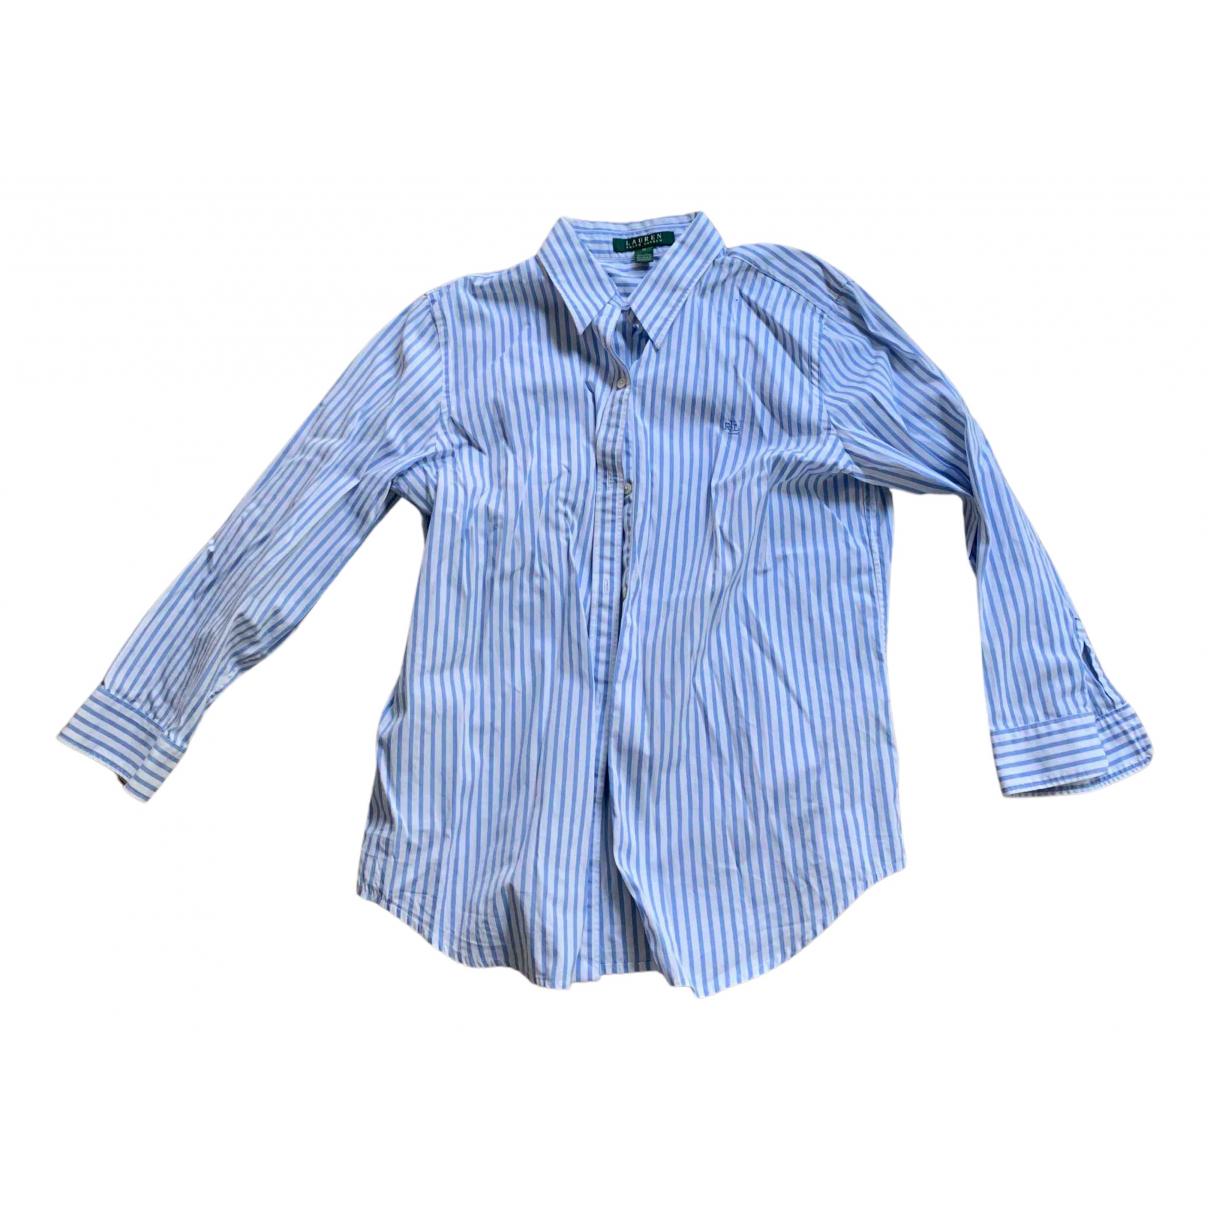 Lauren Ralph Lauren - Top   pour femme en coton - bleu